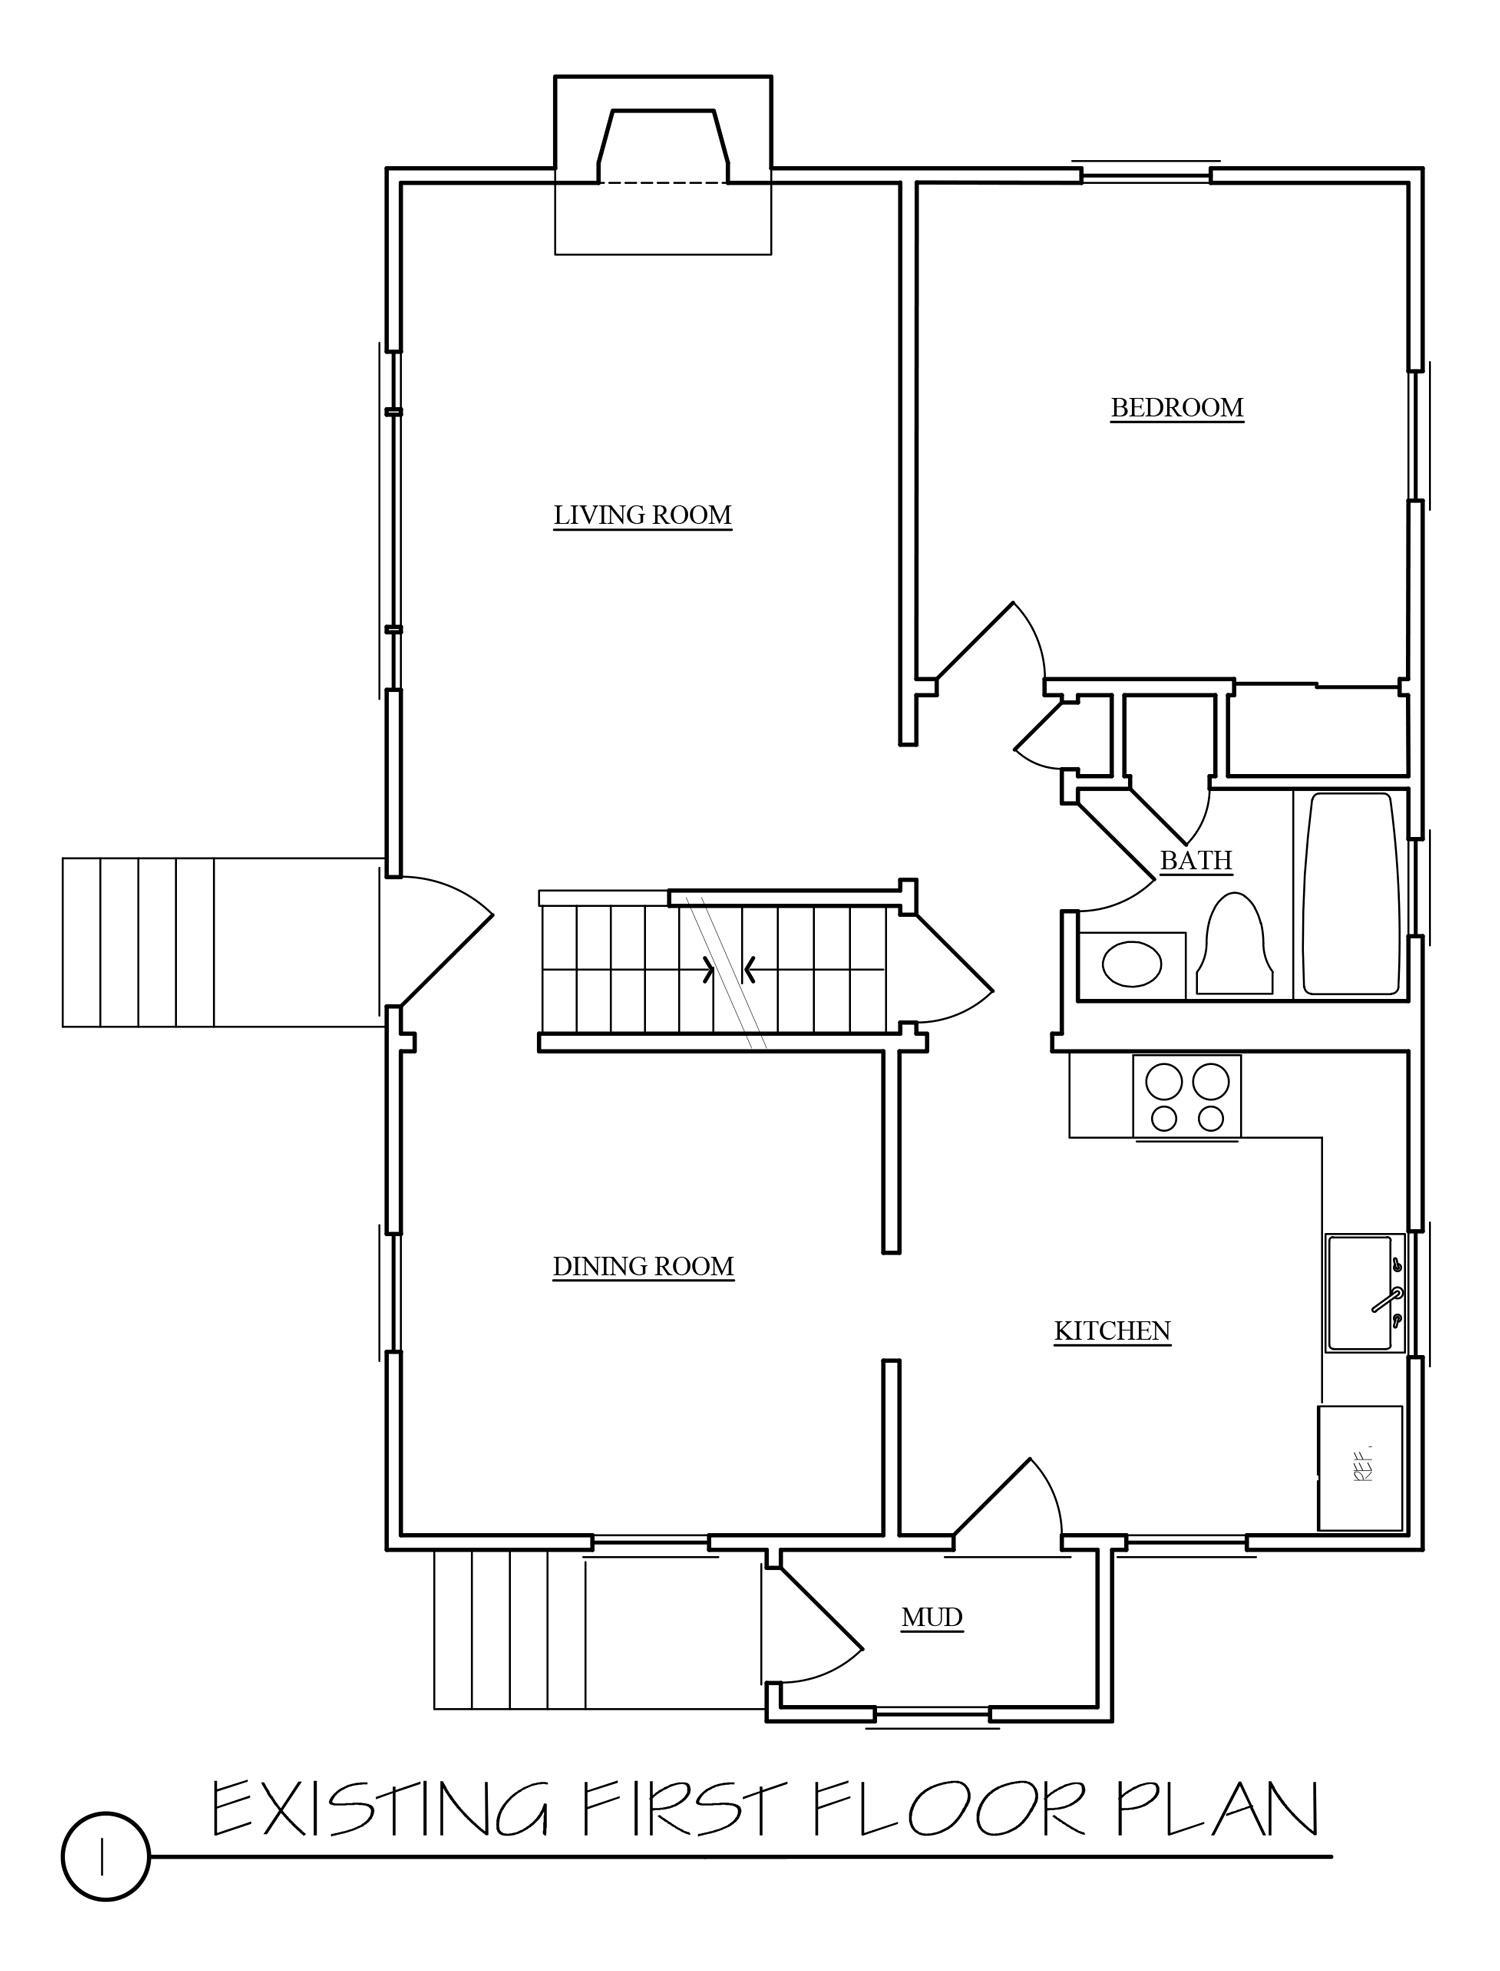 Existing-First-Floor-Plan.jpg